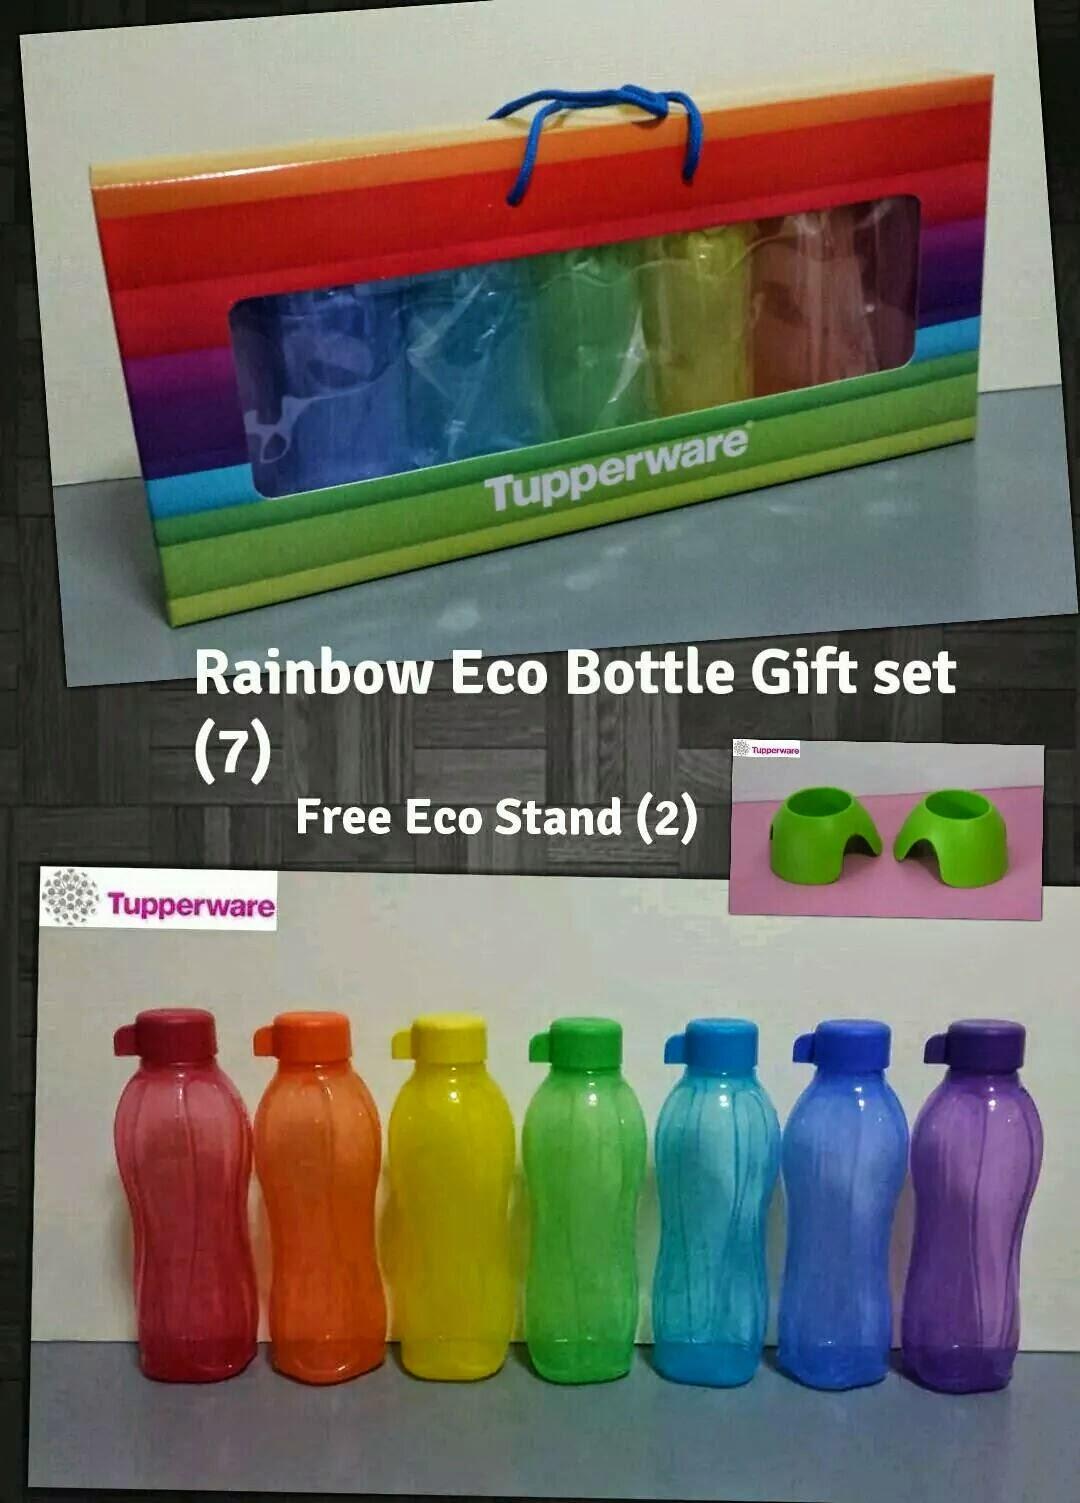 Buy Tupperware In Singapore 2014 Eco 310ml 4 Neon Bottle Rainbow Set 7 500ml